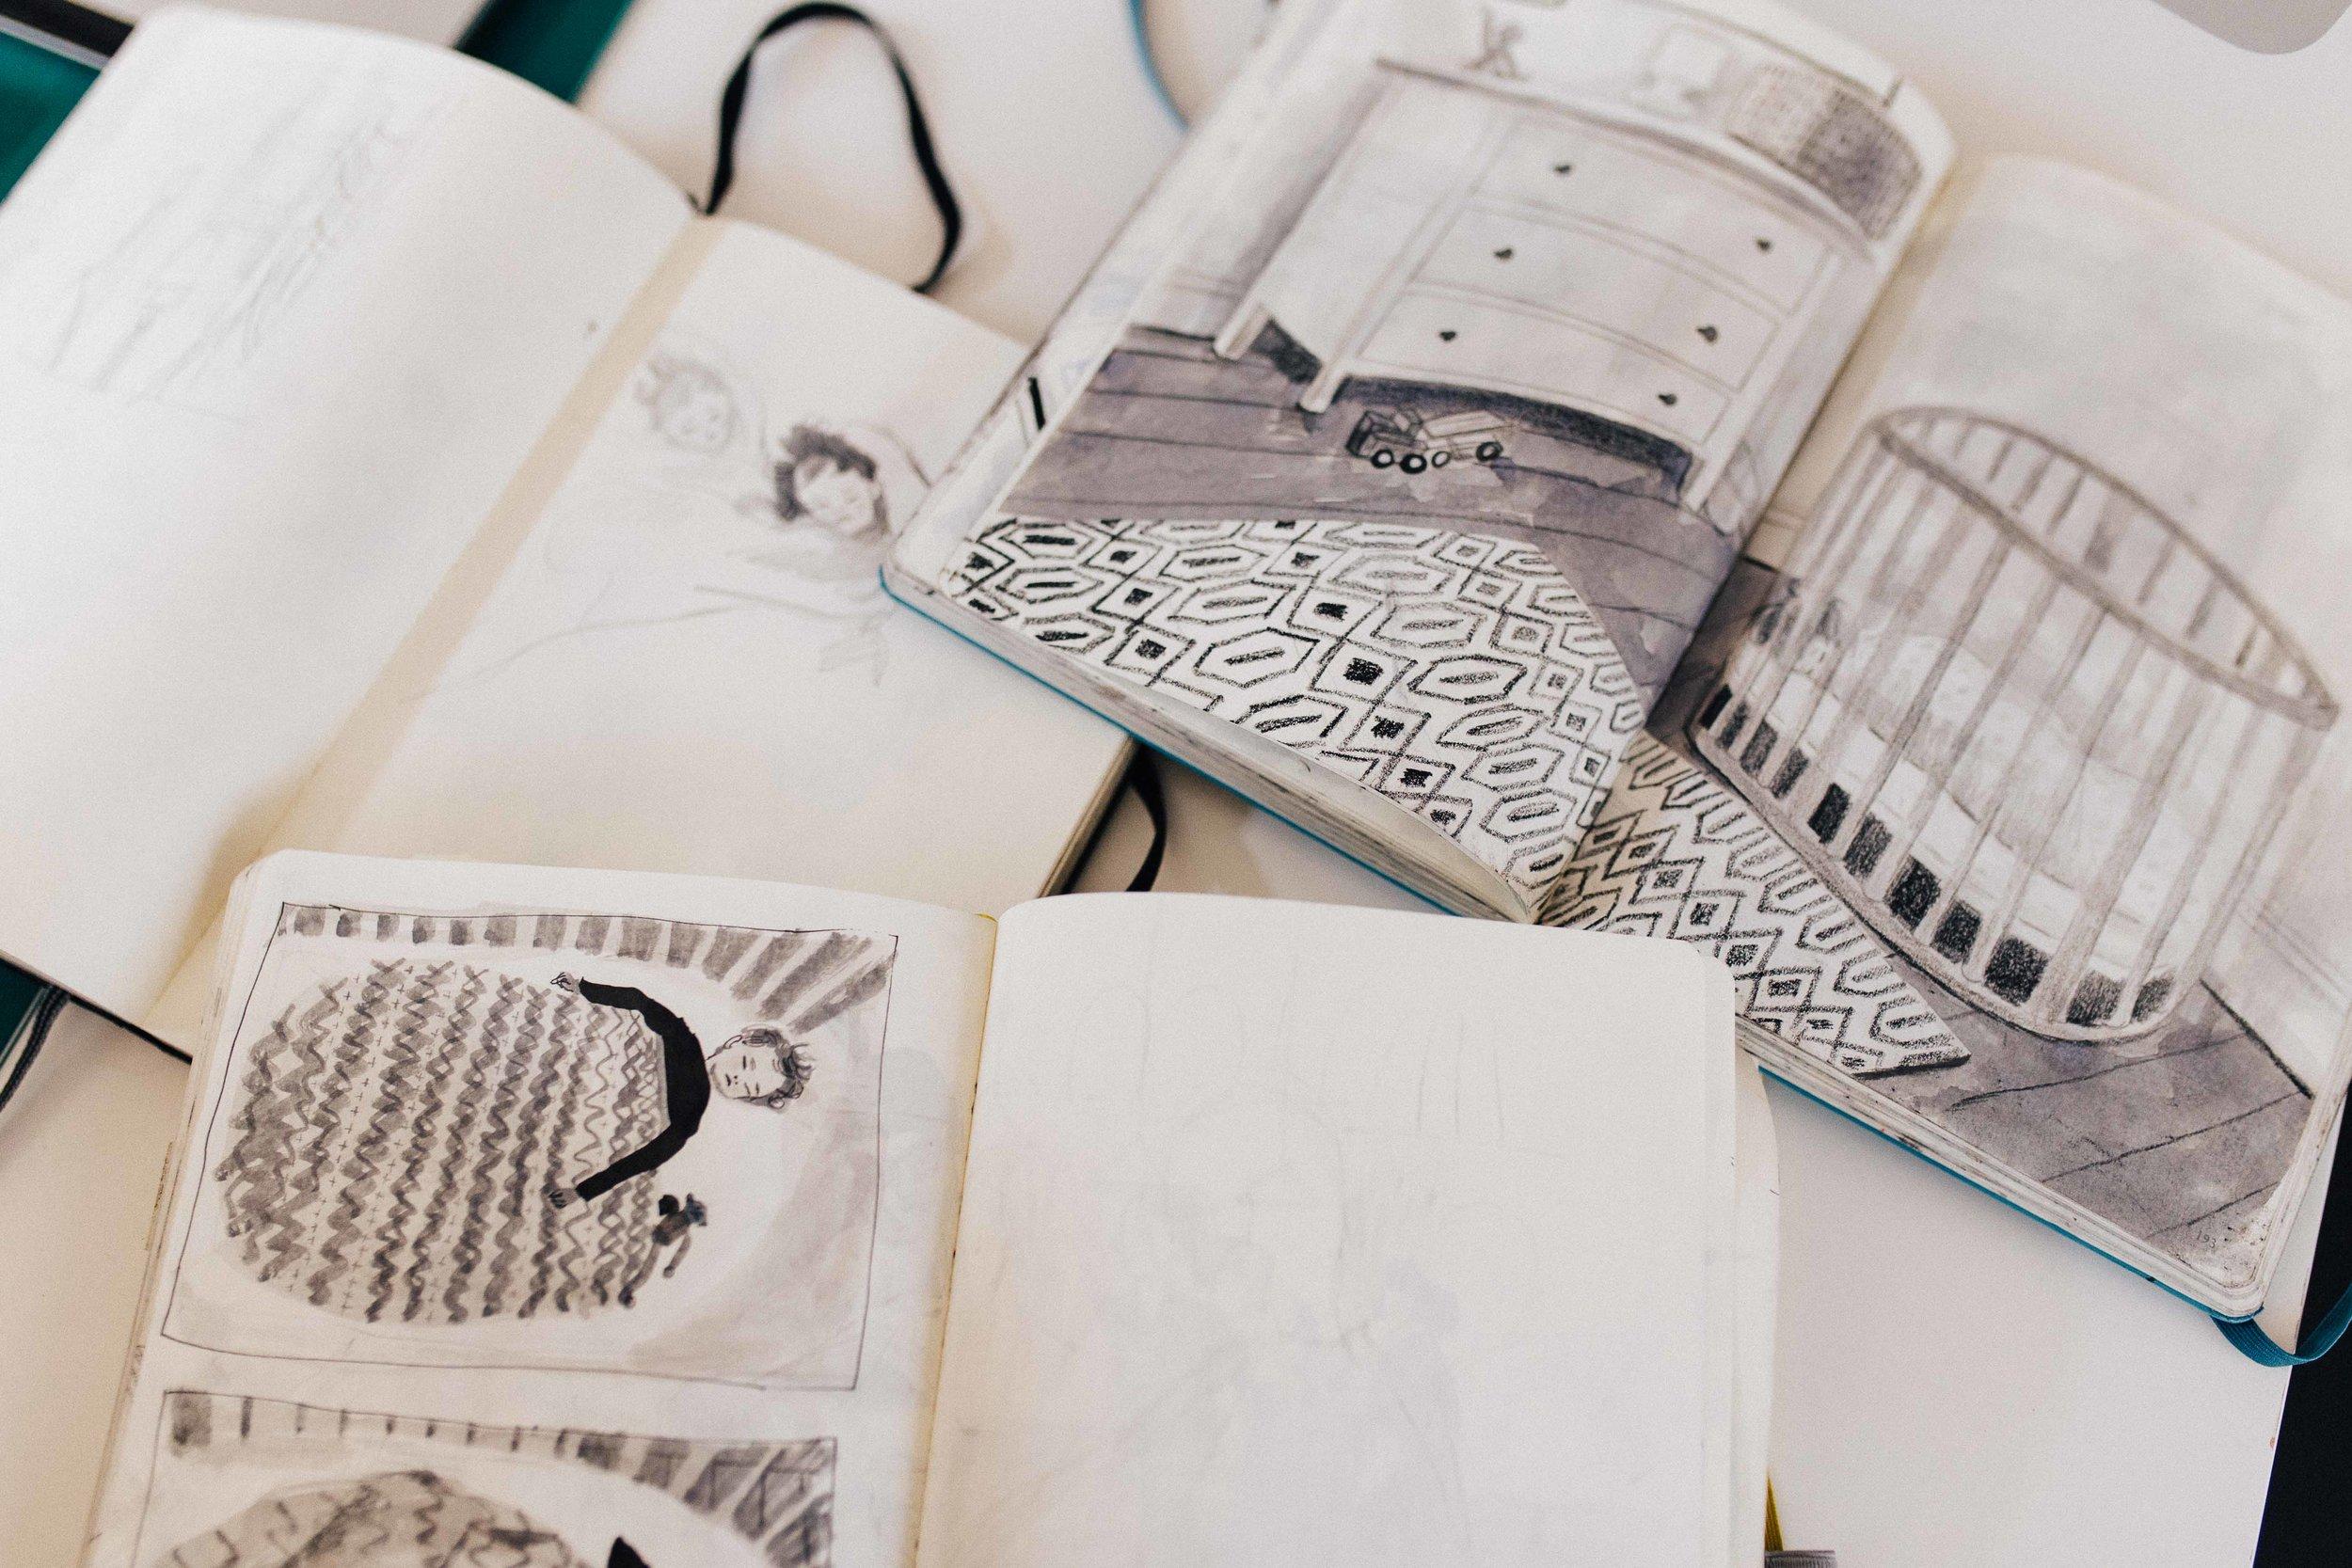 Details of illustrations by artist Emma Farrarons - London branding photography